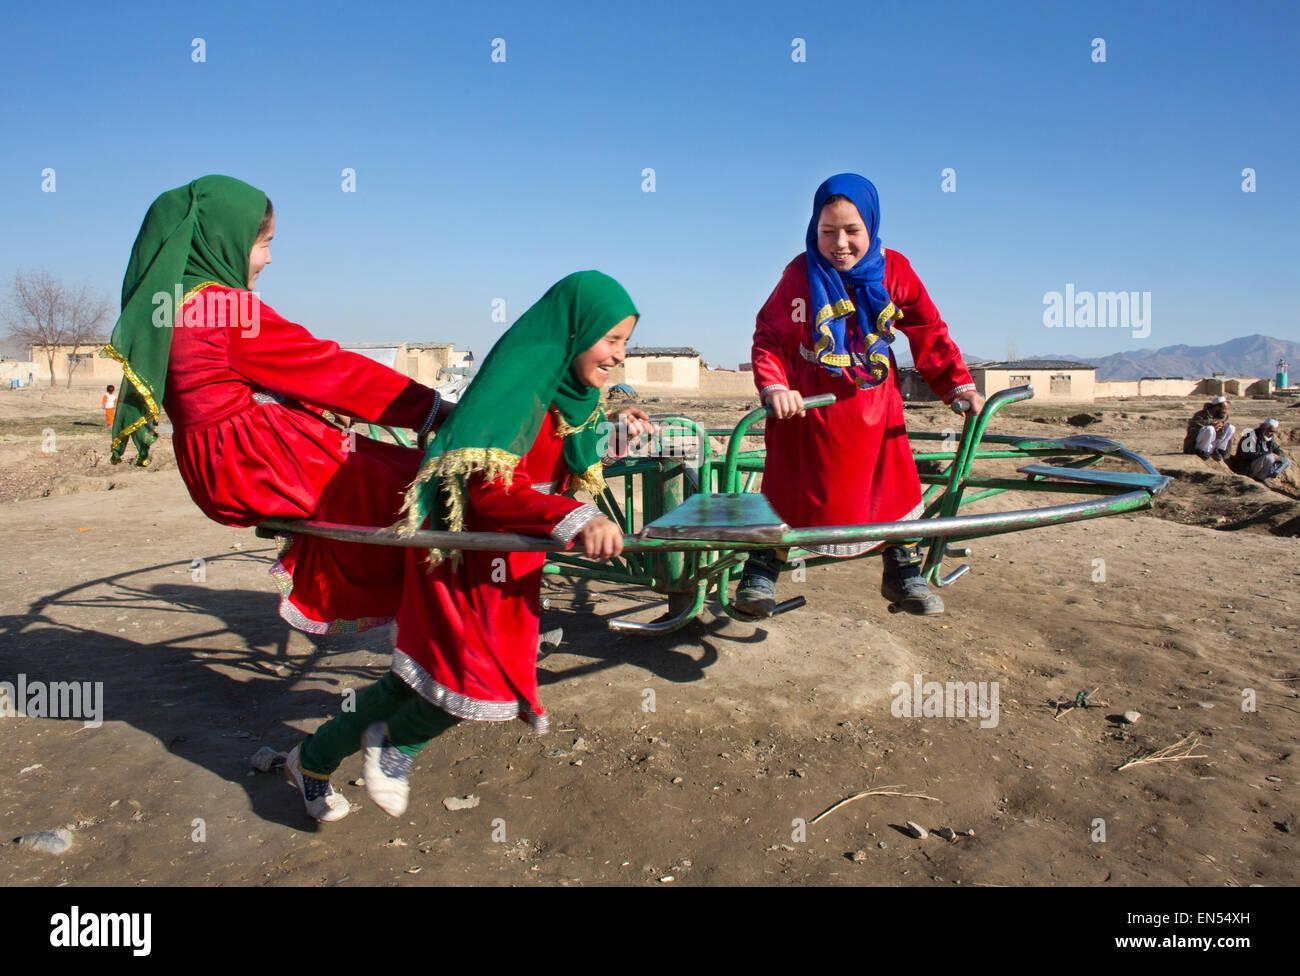 Las alumnas en Kabul Imagen De Stock